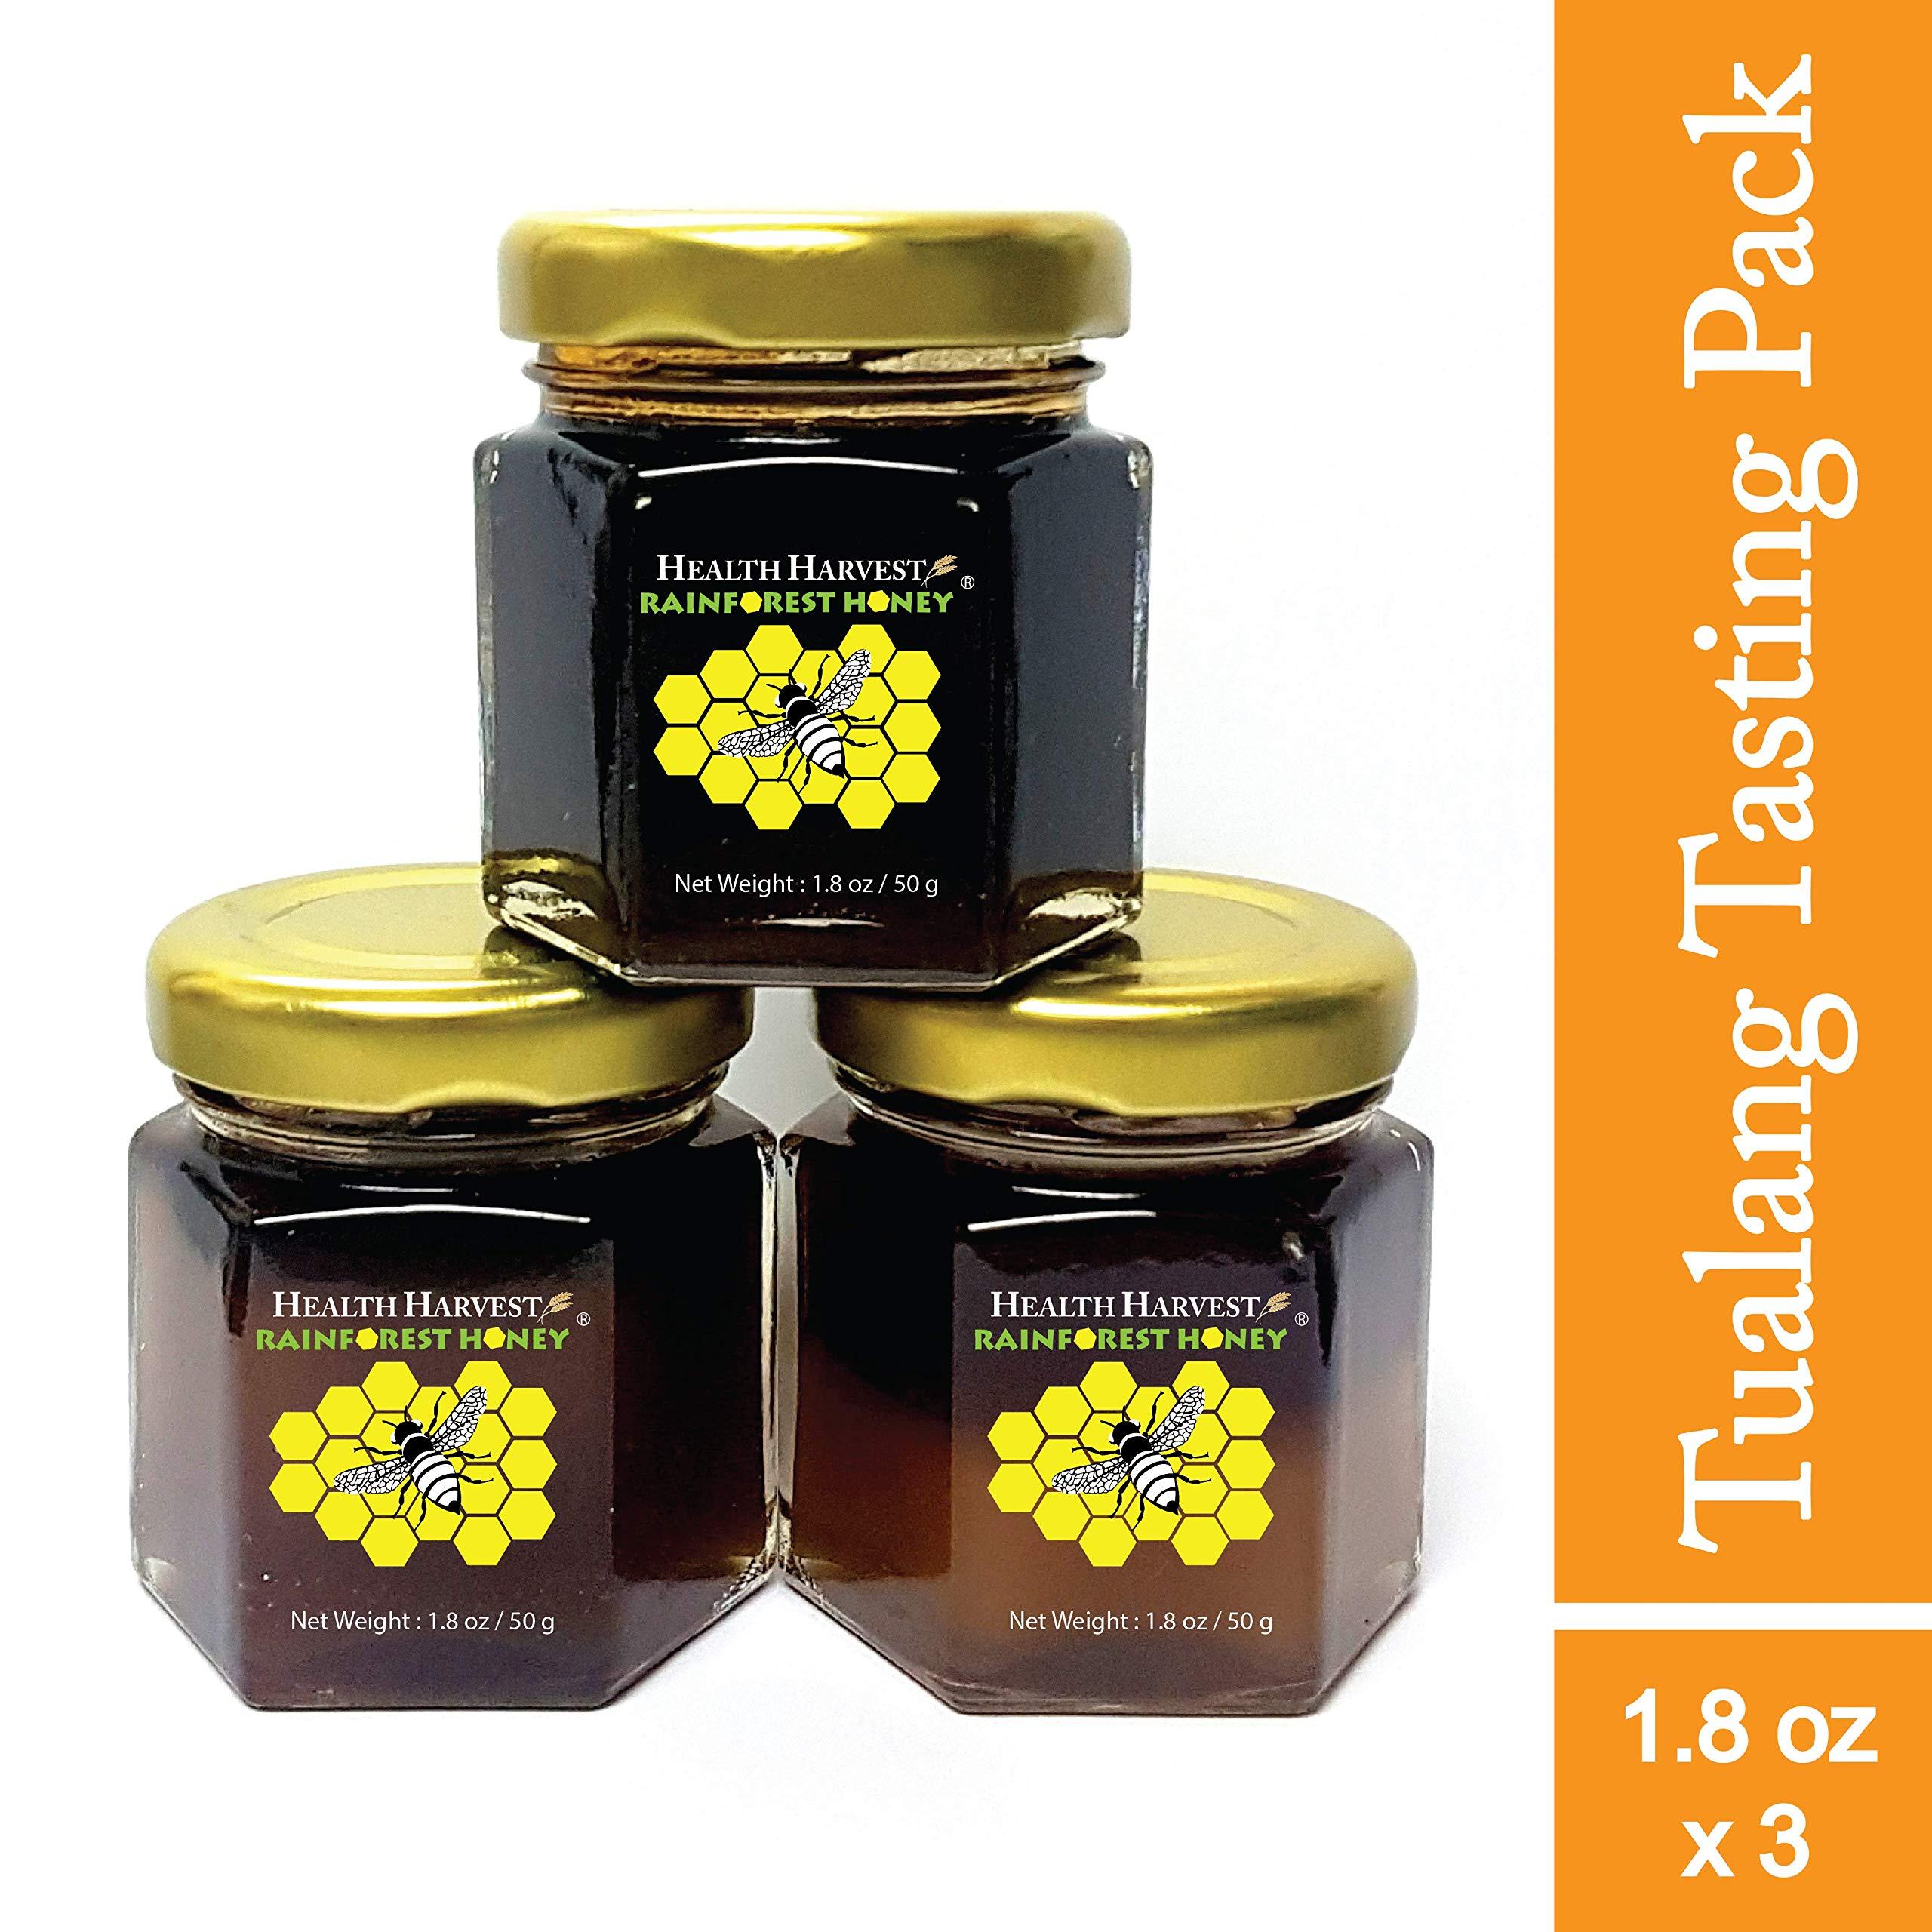 Tualang Honey 1.8 oz x 3 Jars (Tasting Mini-Pack: Black, Red, Yellow Honey)   Best Season Wild Harvested from Sumatra Tropical Rainforest   Raw, Unpasteurized, Unfiltered   Award-Winning